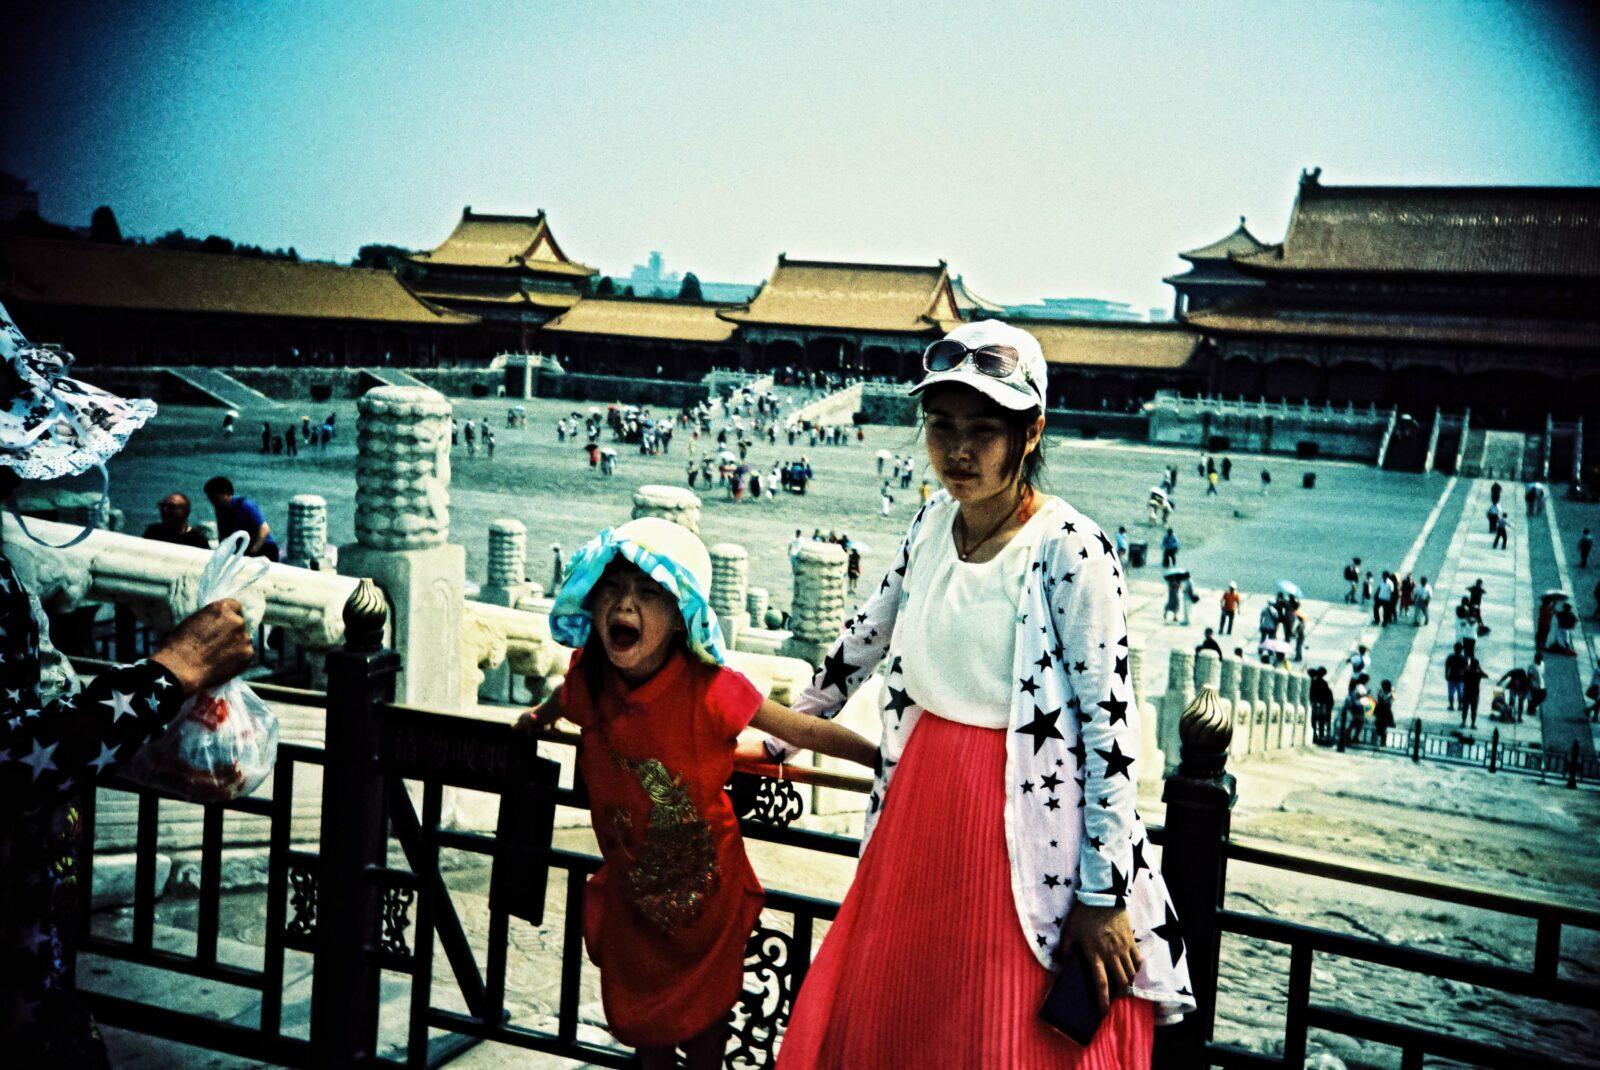 instaCDV 15 China roll11 Beijing ForbiddenCity 000026